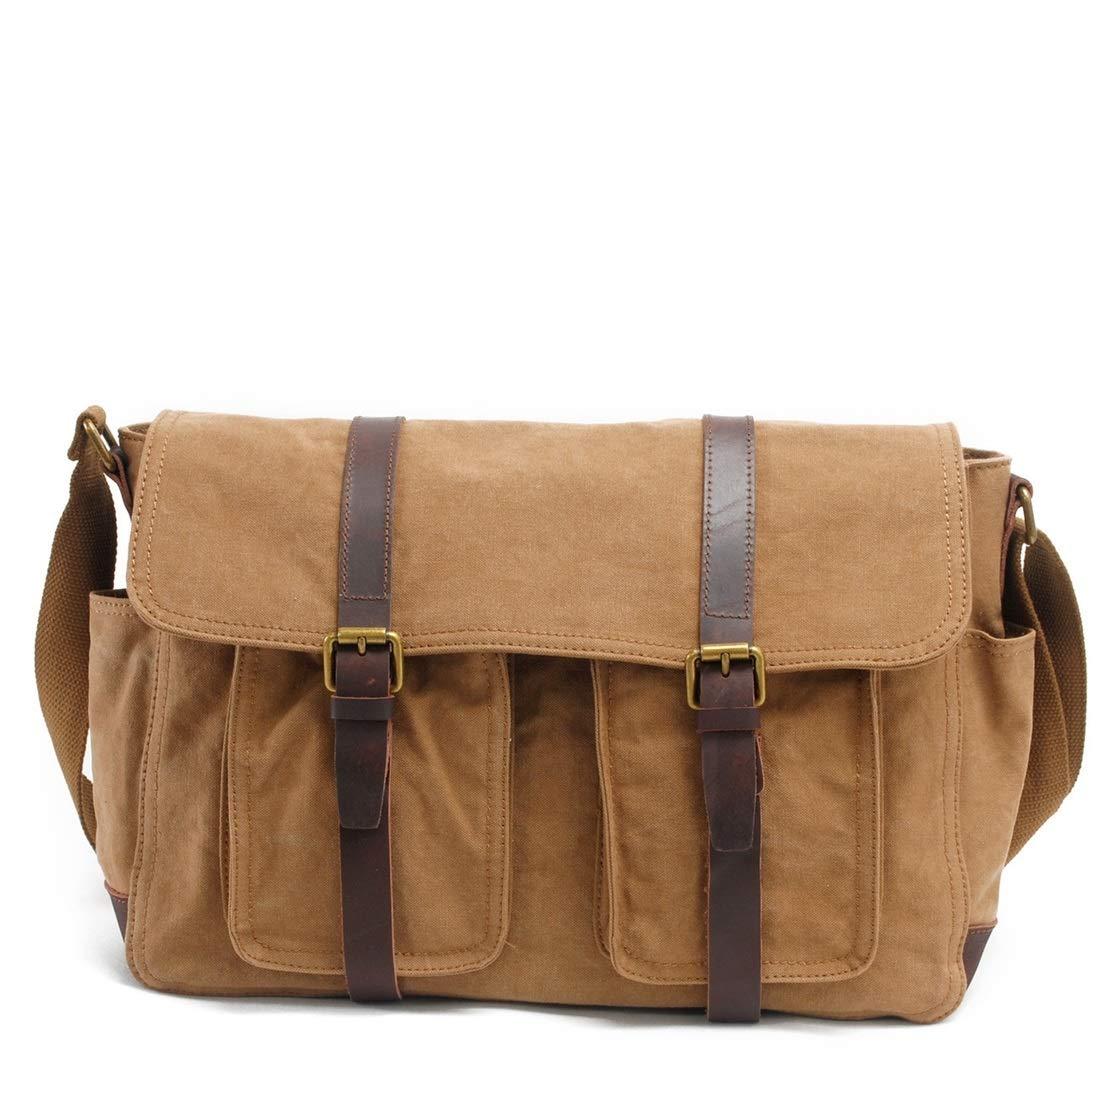 KRPENRIO Mens Bag Messenger Bag Canvas Shoulder Bags Travel Bag Man Purse Crossbody Bags for Work Business Color : Khaki